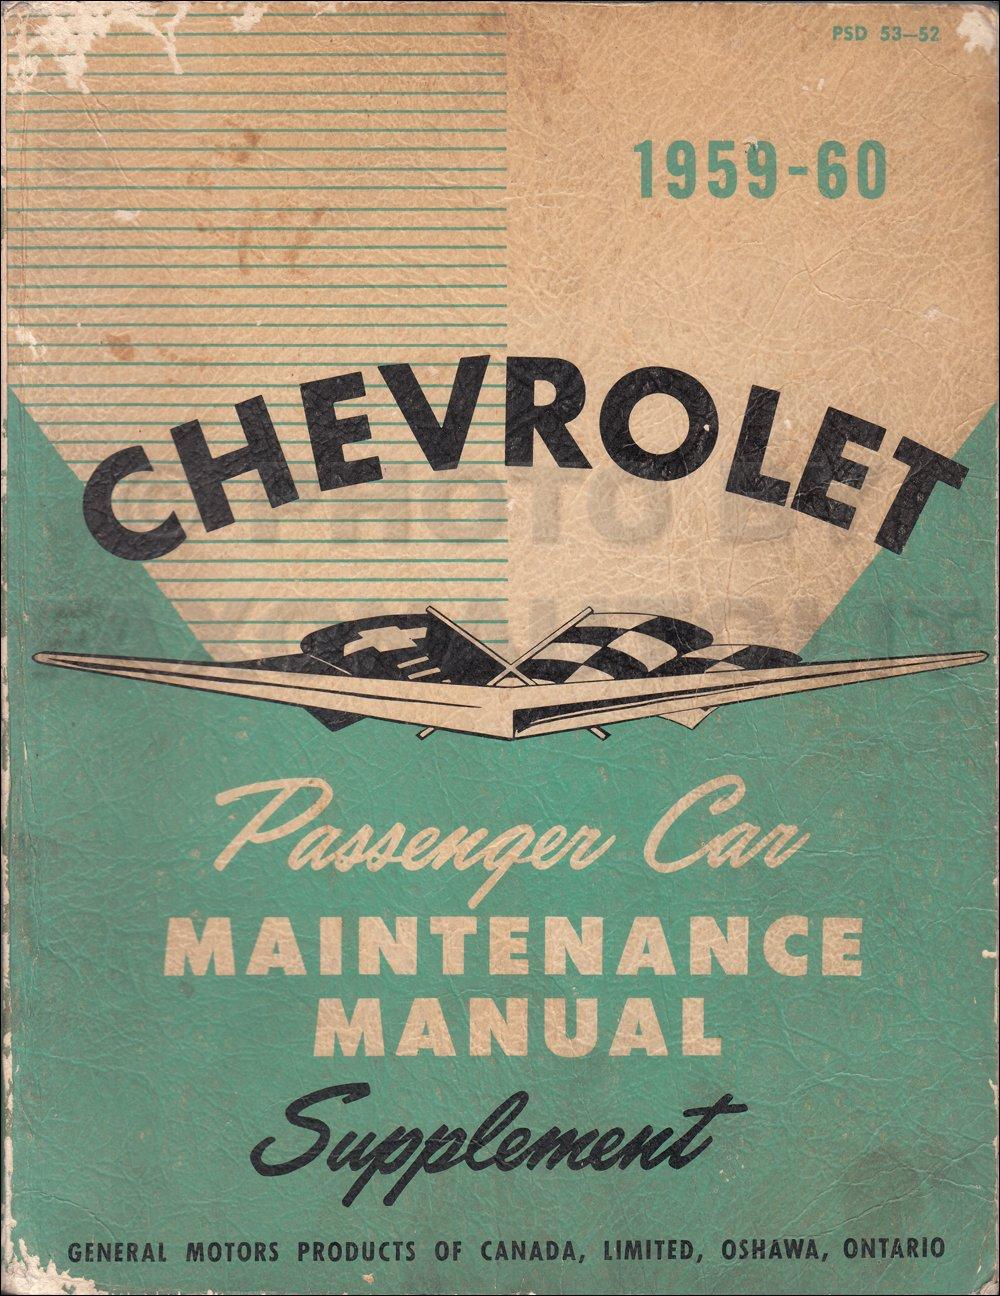 1959-1960 Chevrolet Repair Shop Manual Original Supplement Cars & El Camino:  Chevrolet: Amazon.com: Books